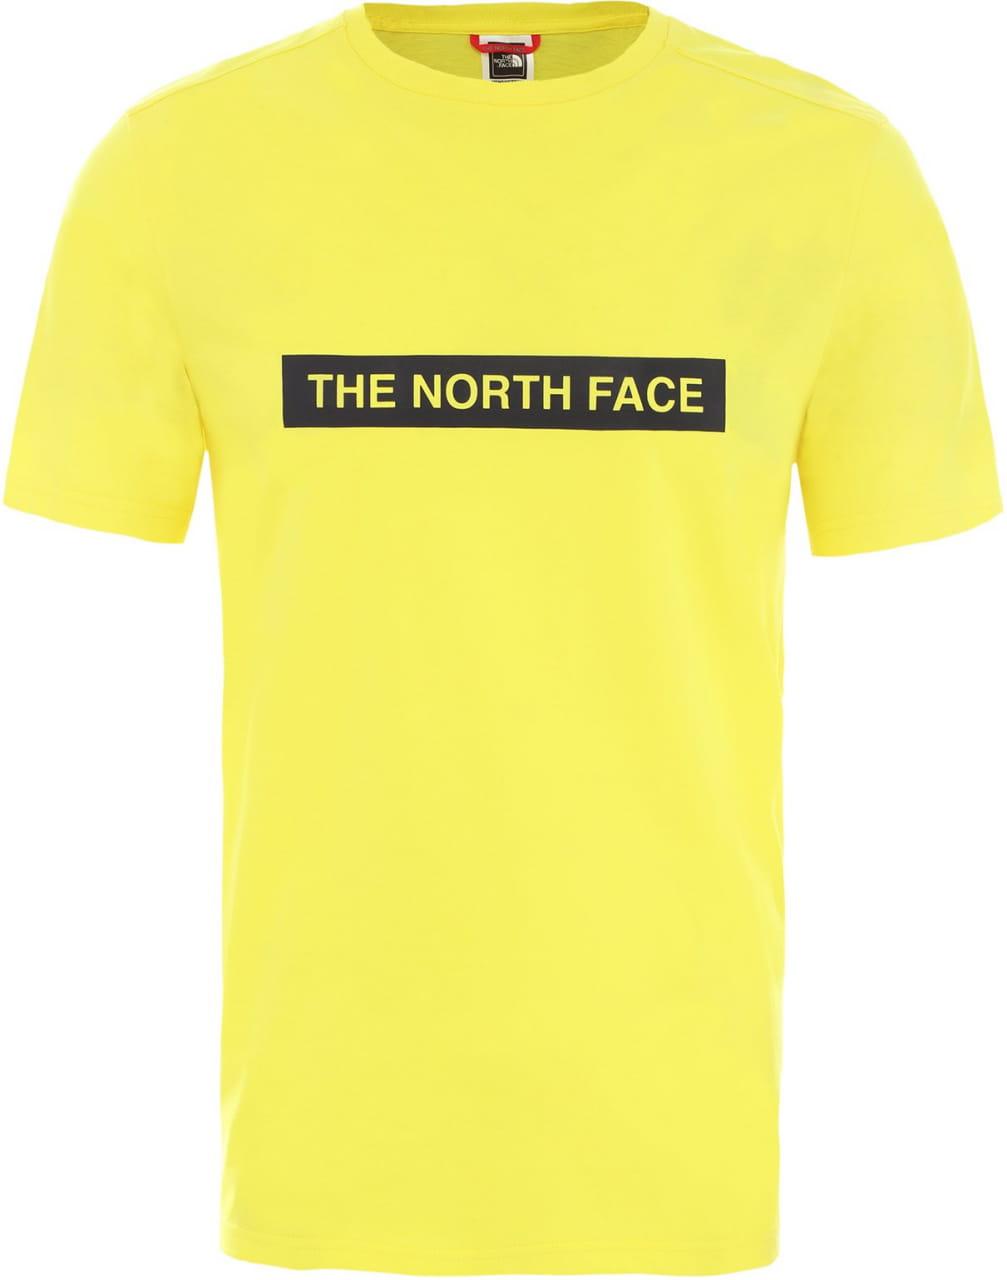 T-Shirts The North Face Men's Light T-Shirt